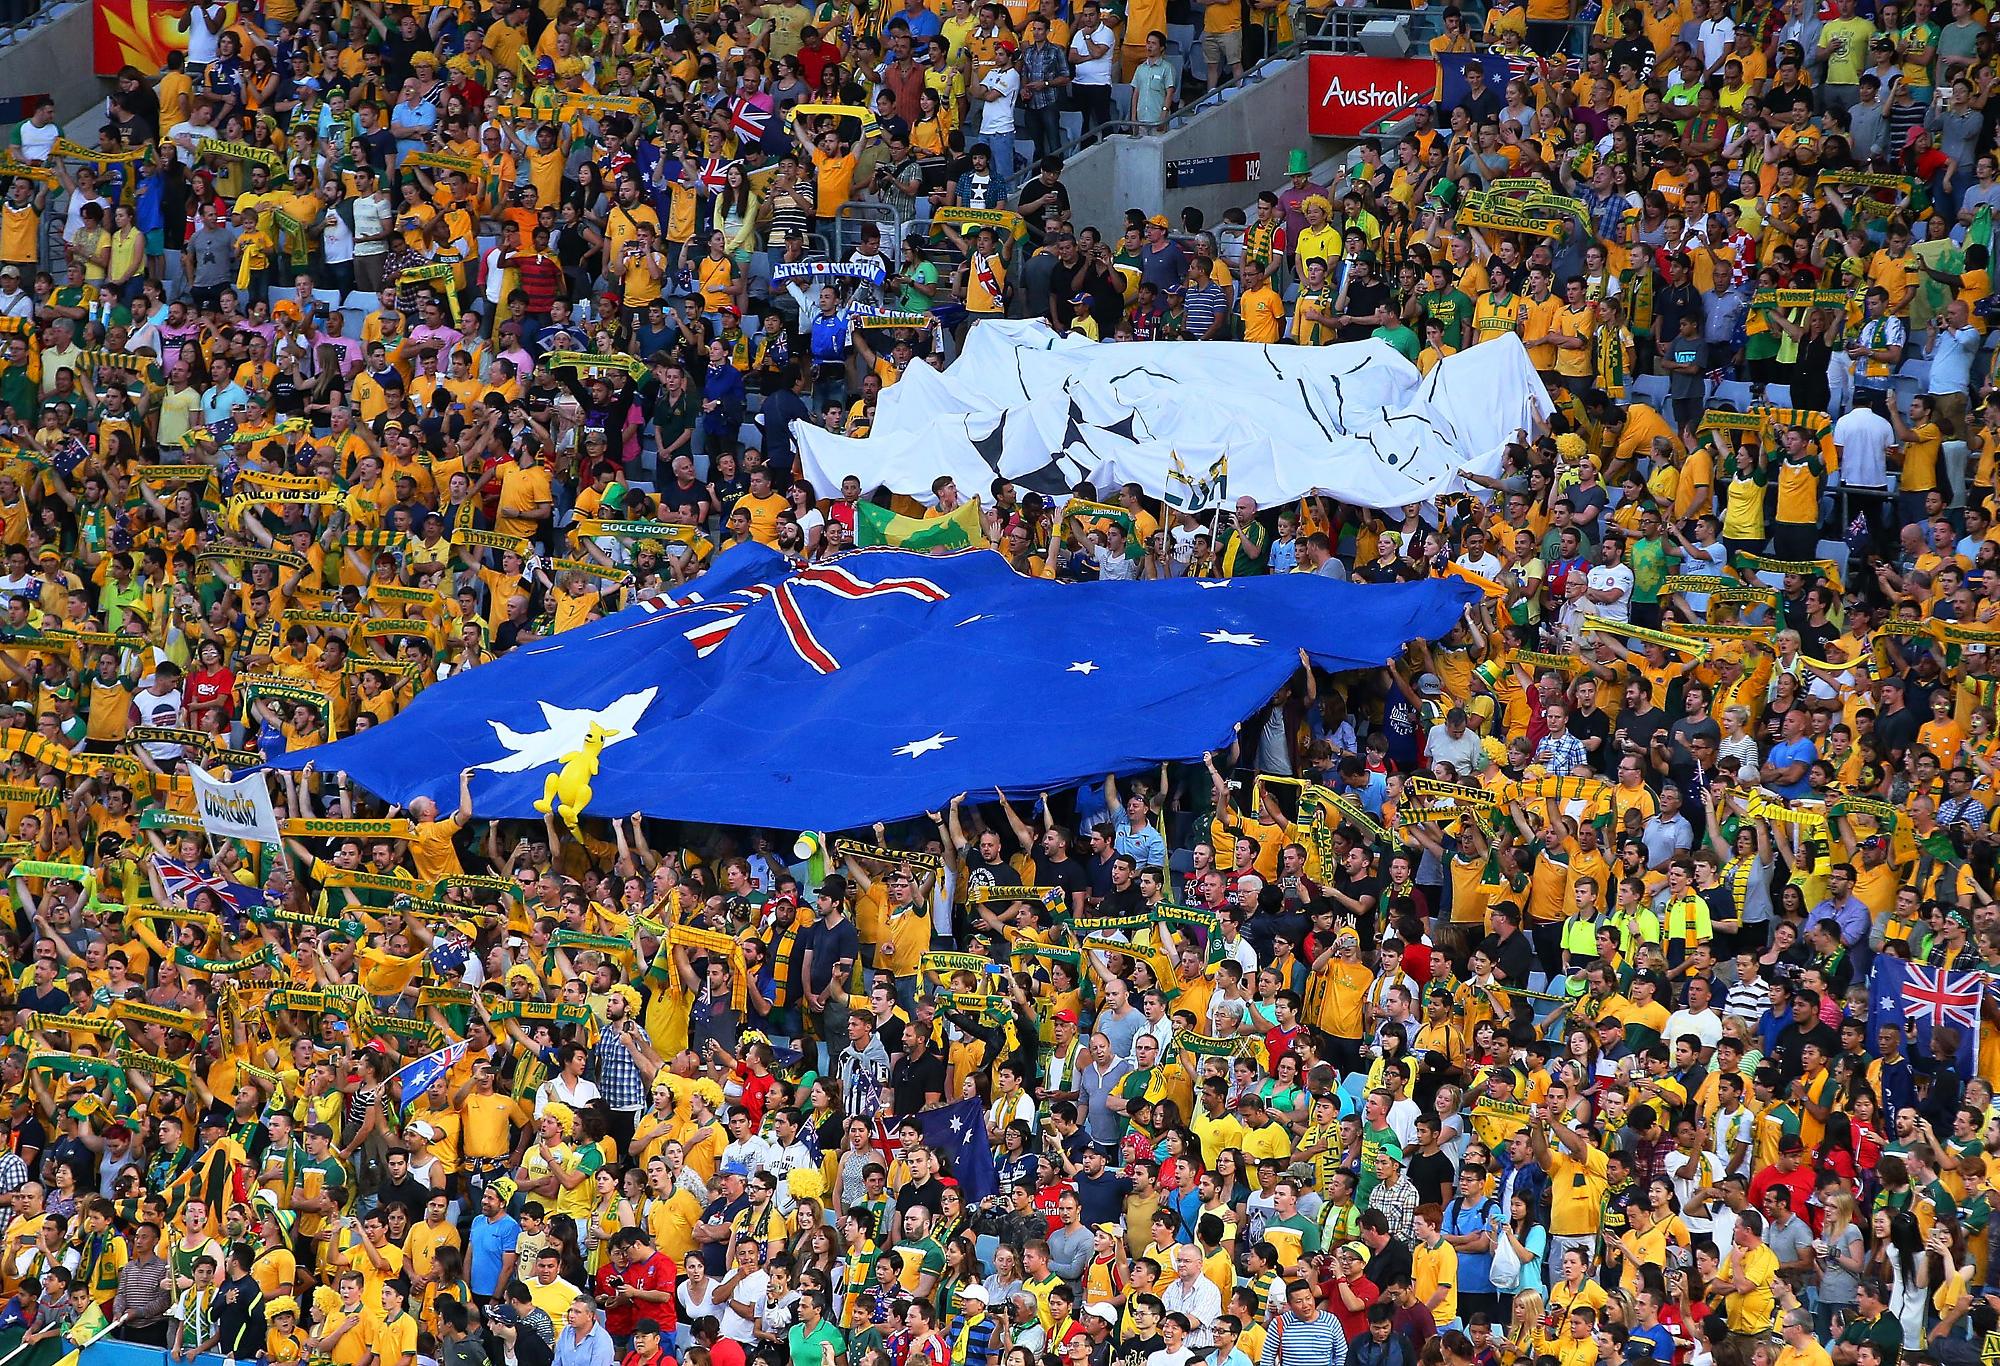 Socceroos fans celebrate